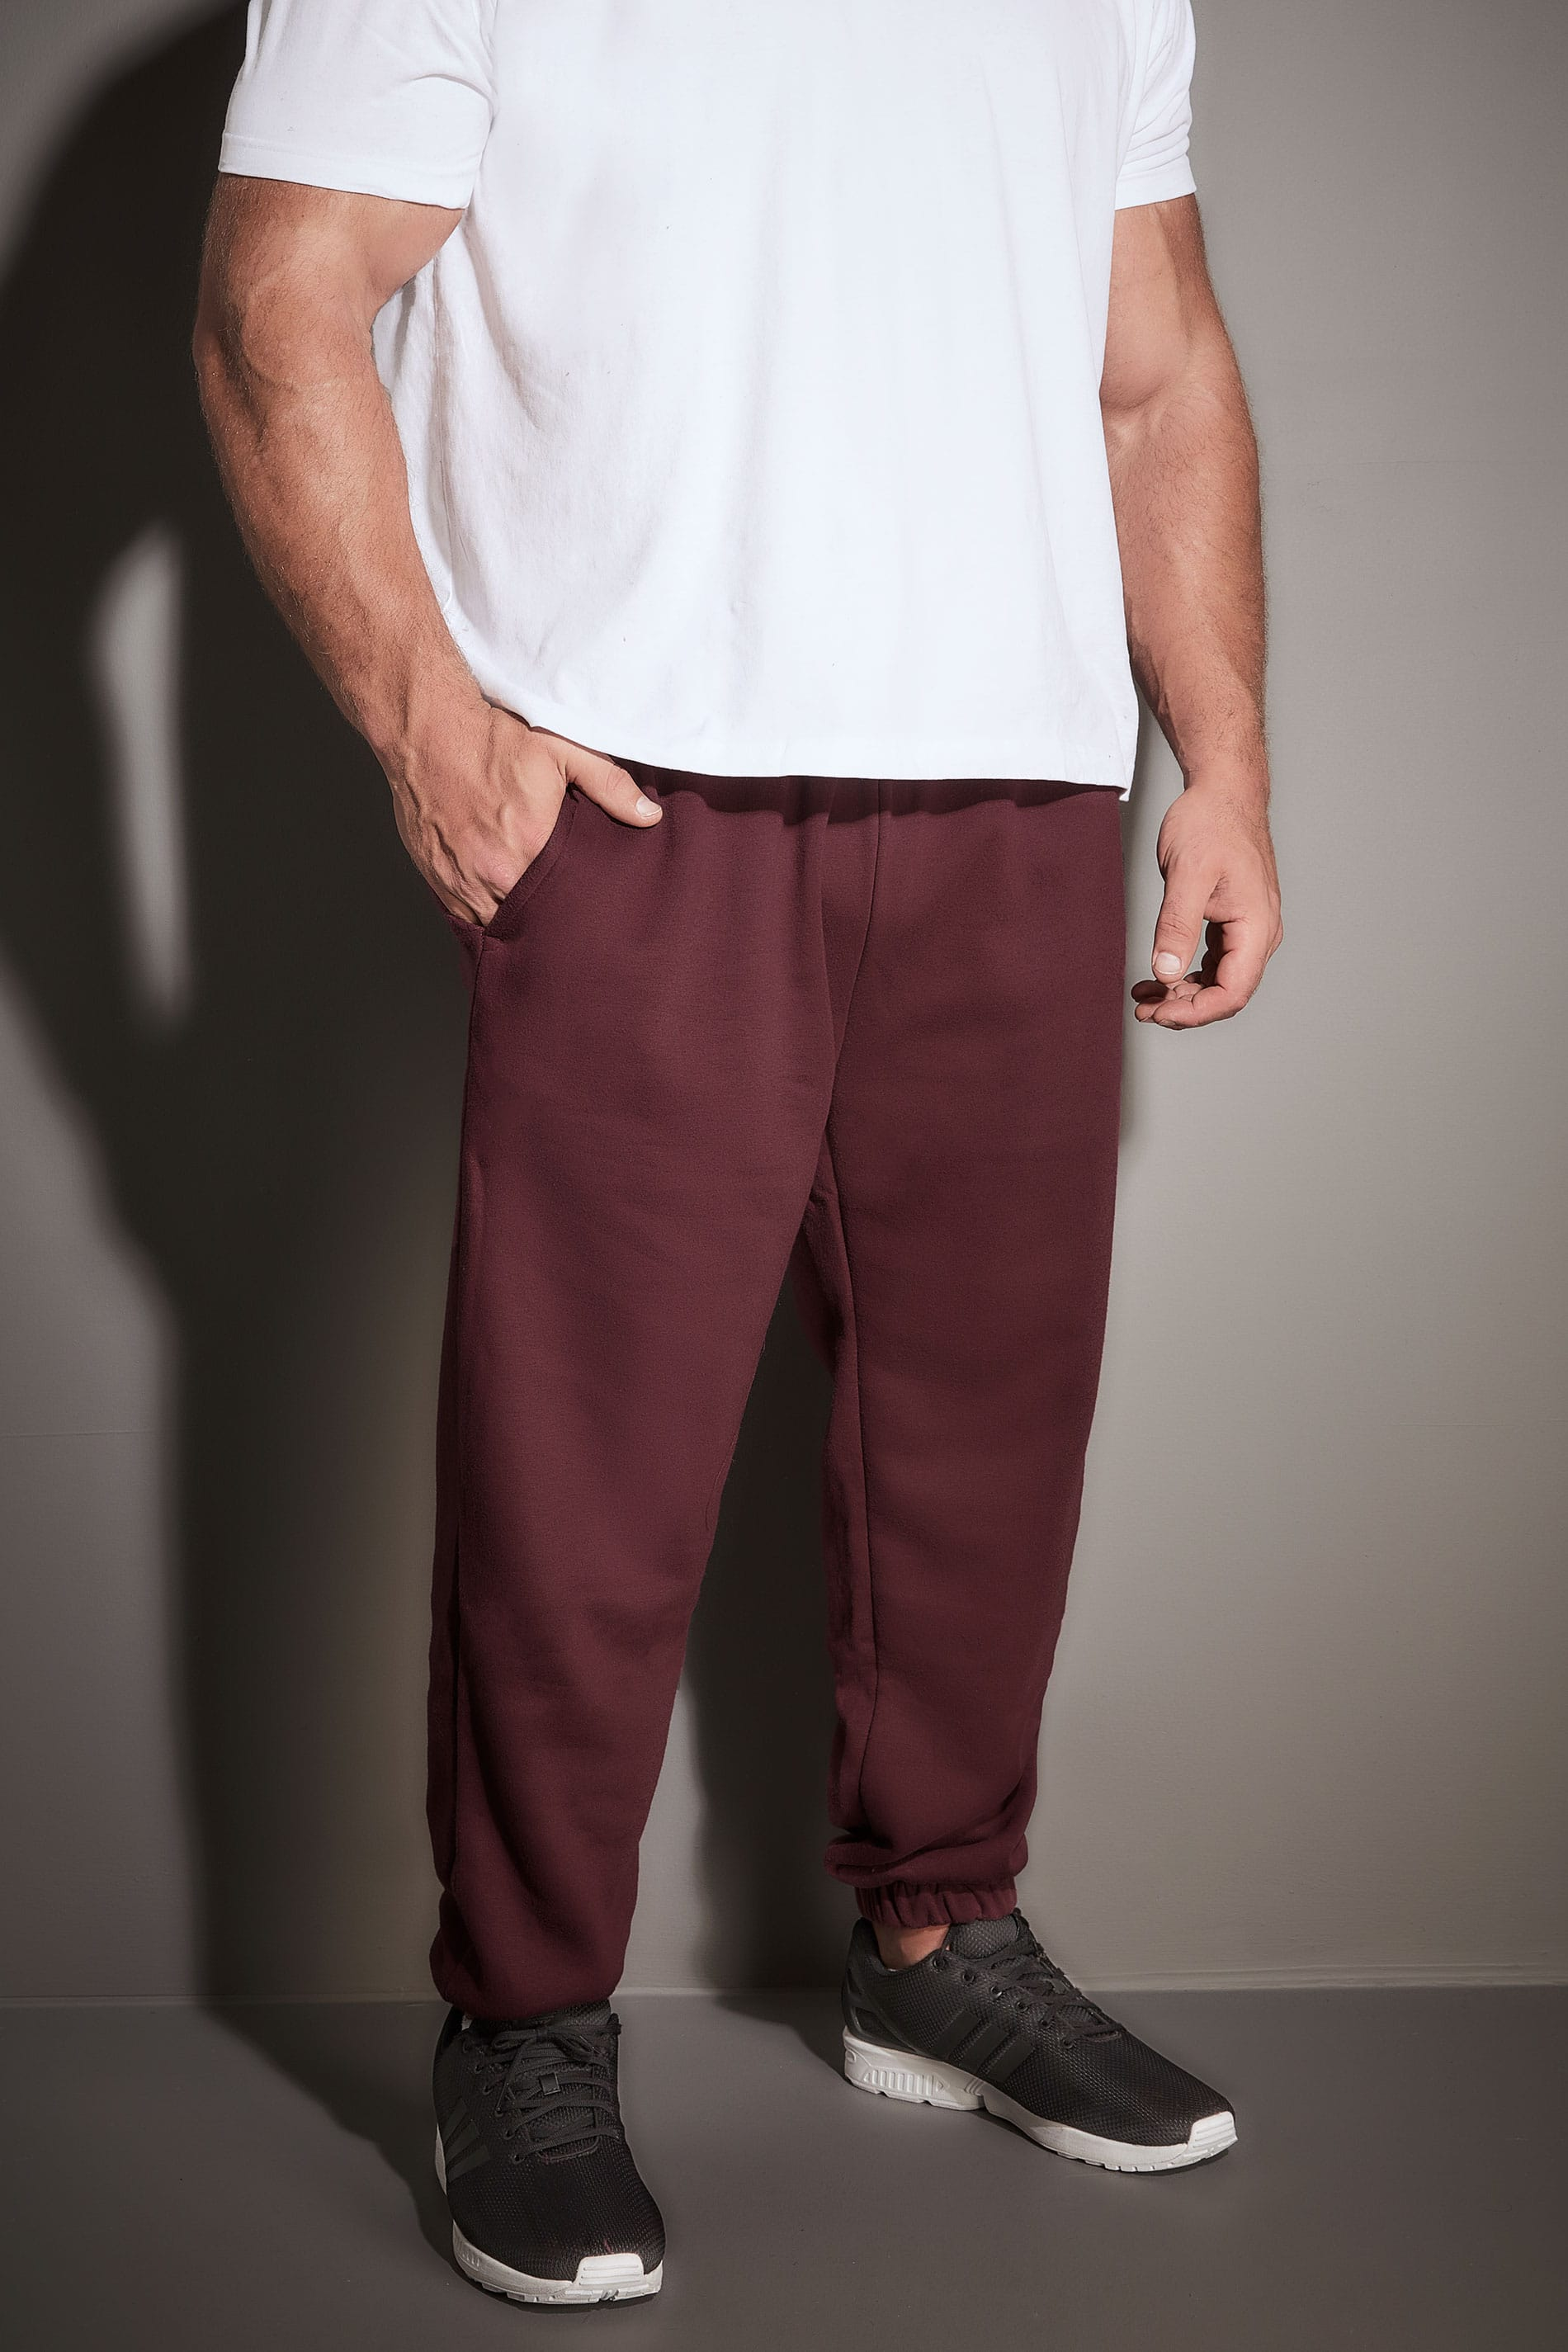 BadRhino Burgundy Basic Sweat Joggers With Pockets